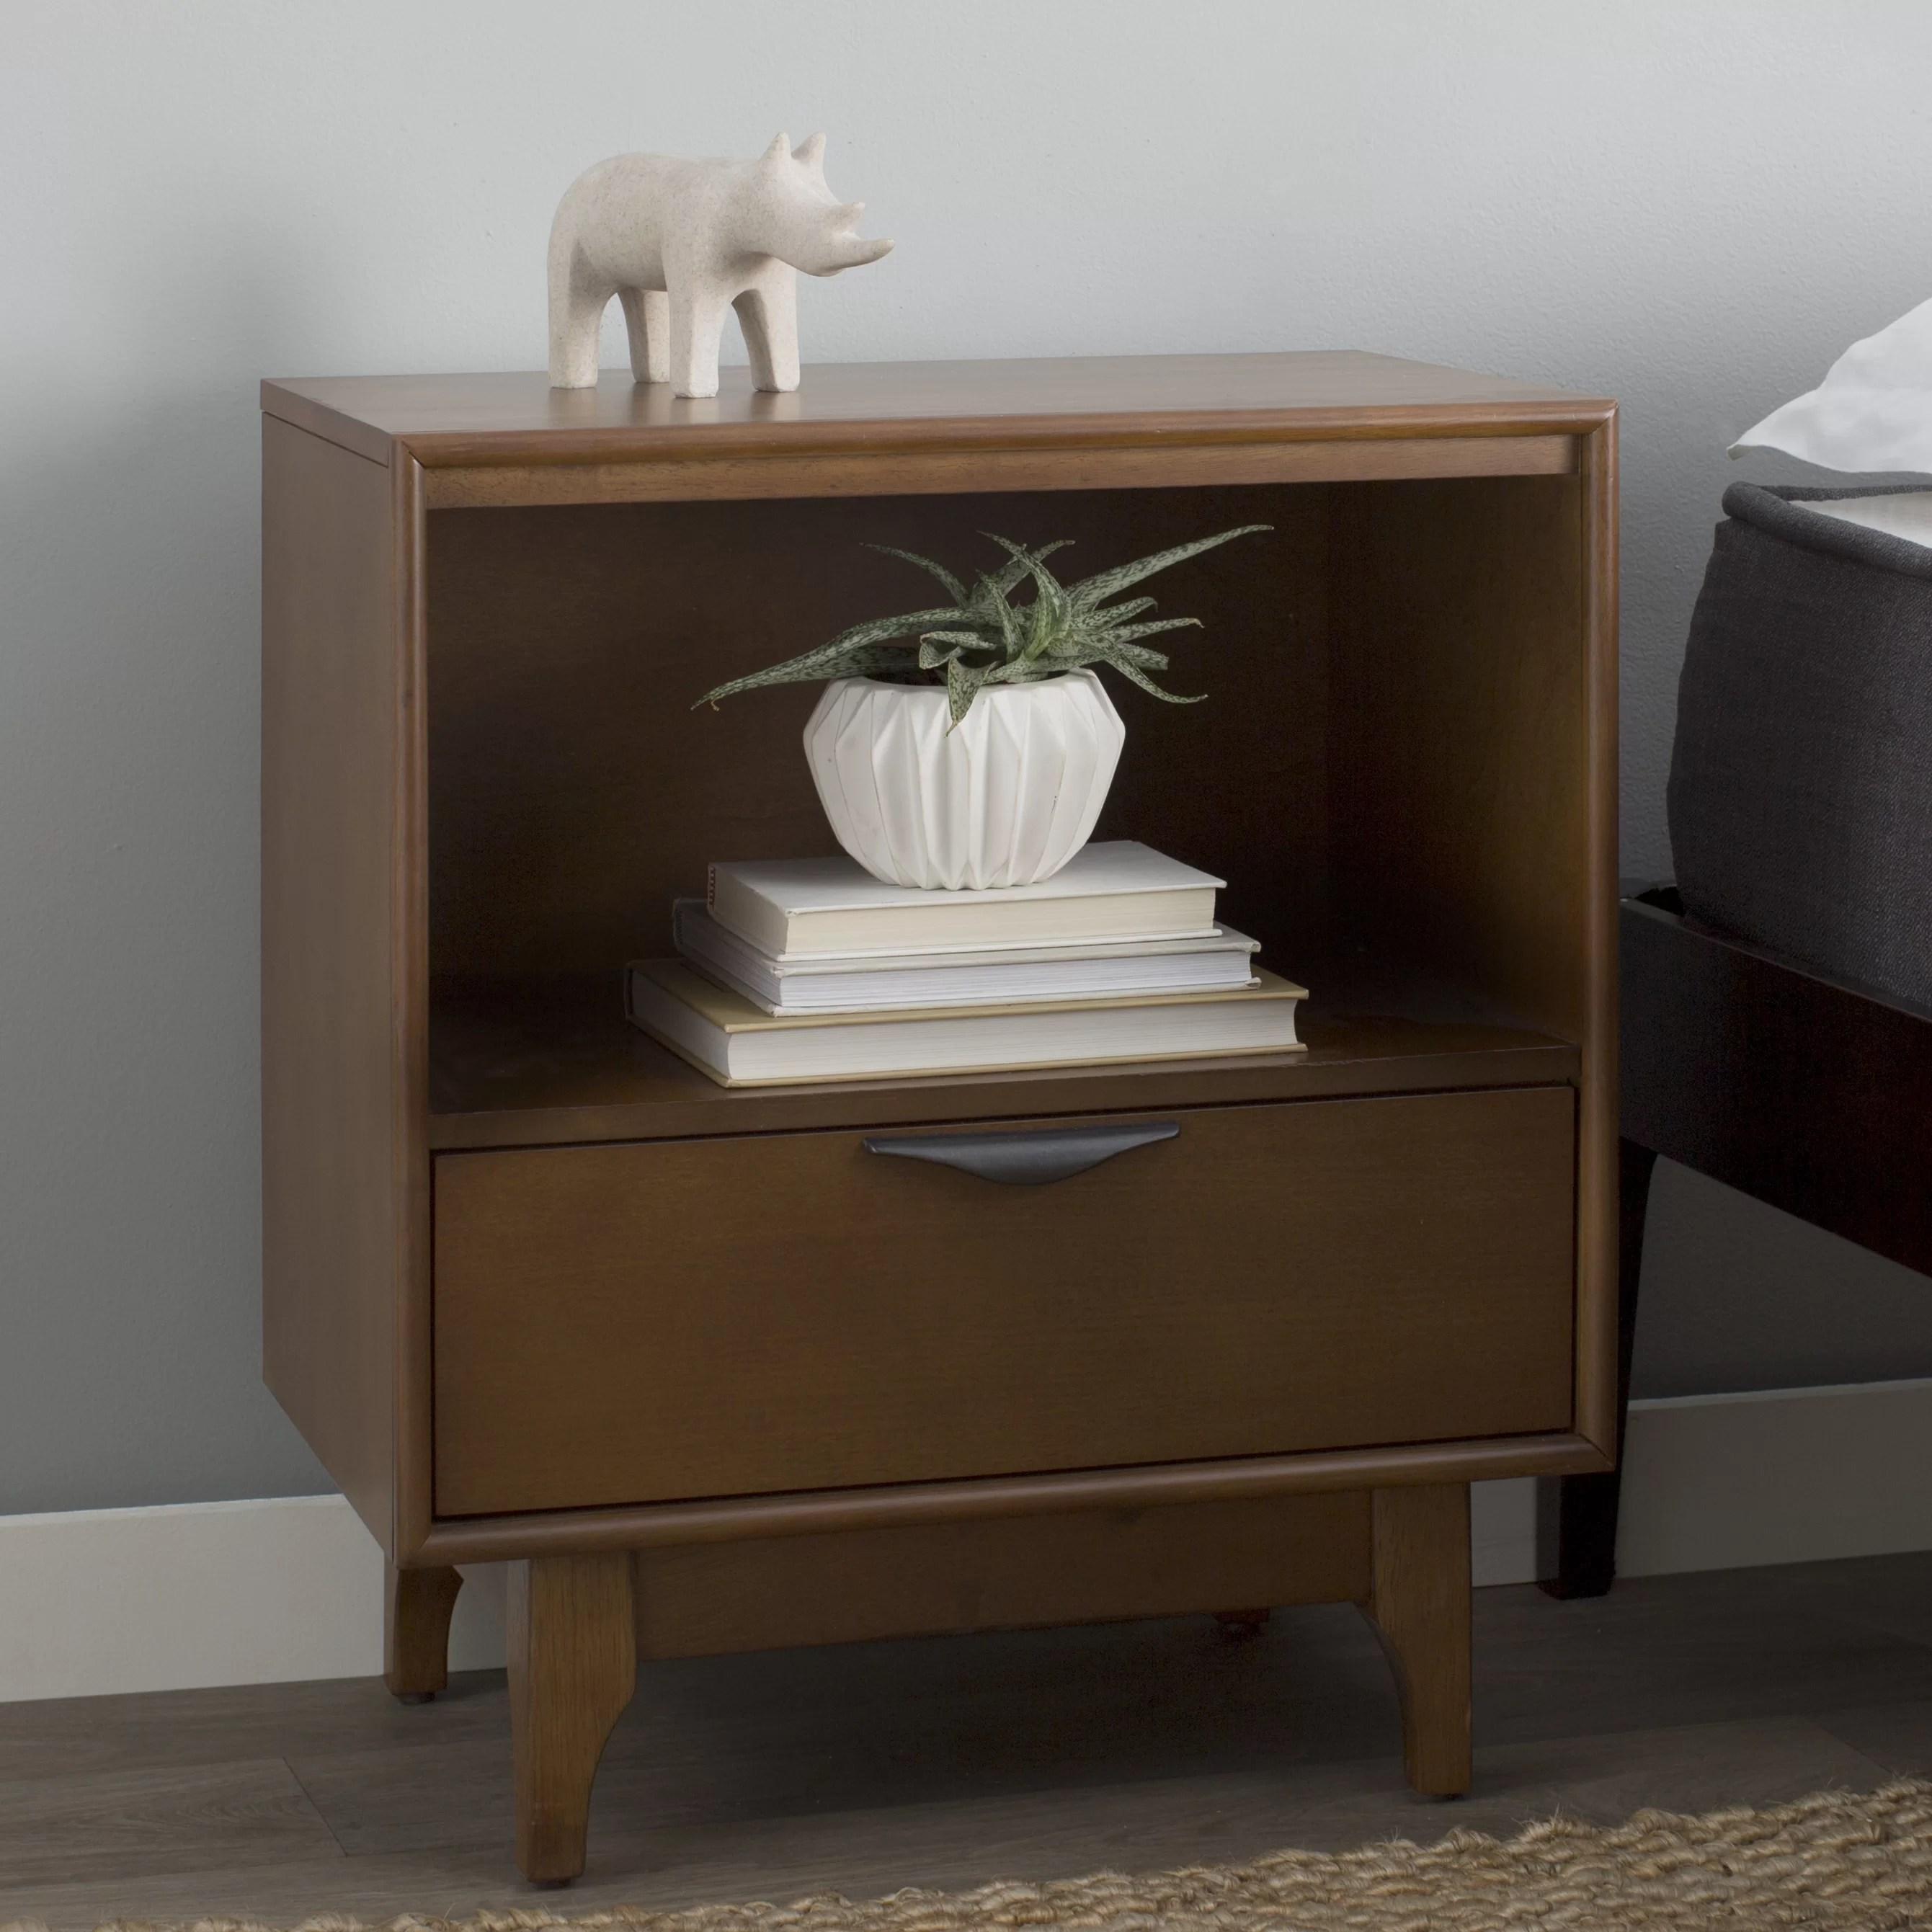 Modern Rustic Interiors Denzel 1 Drawer Nightstand